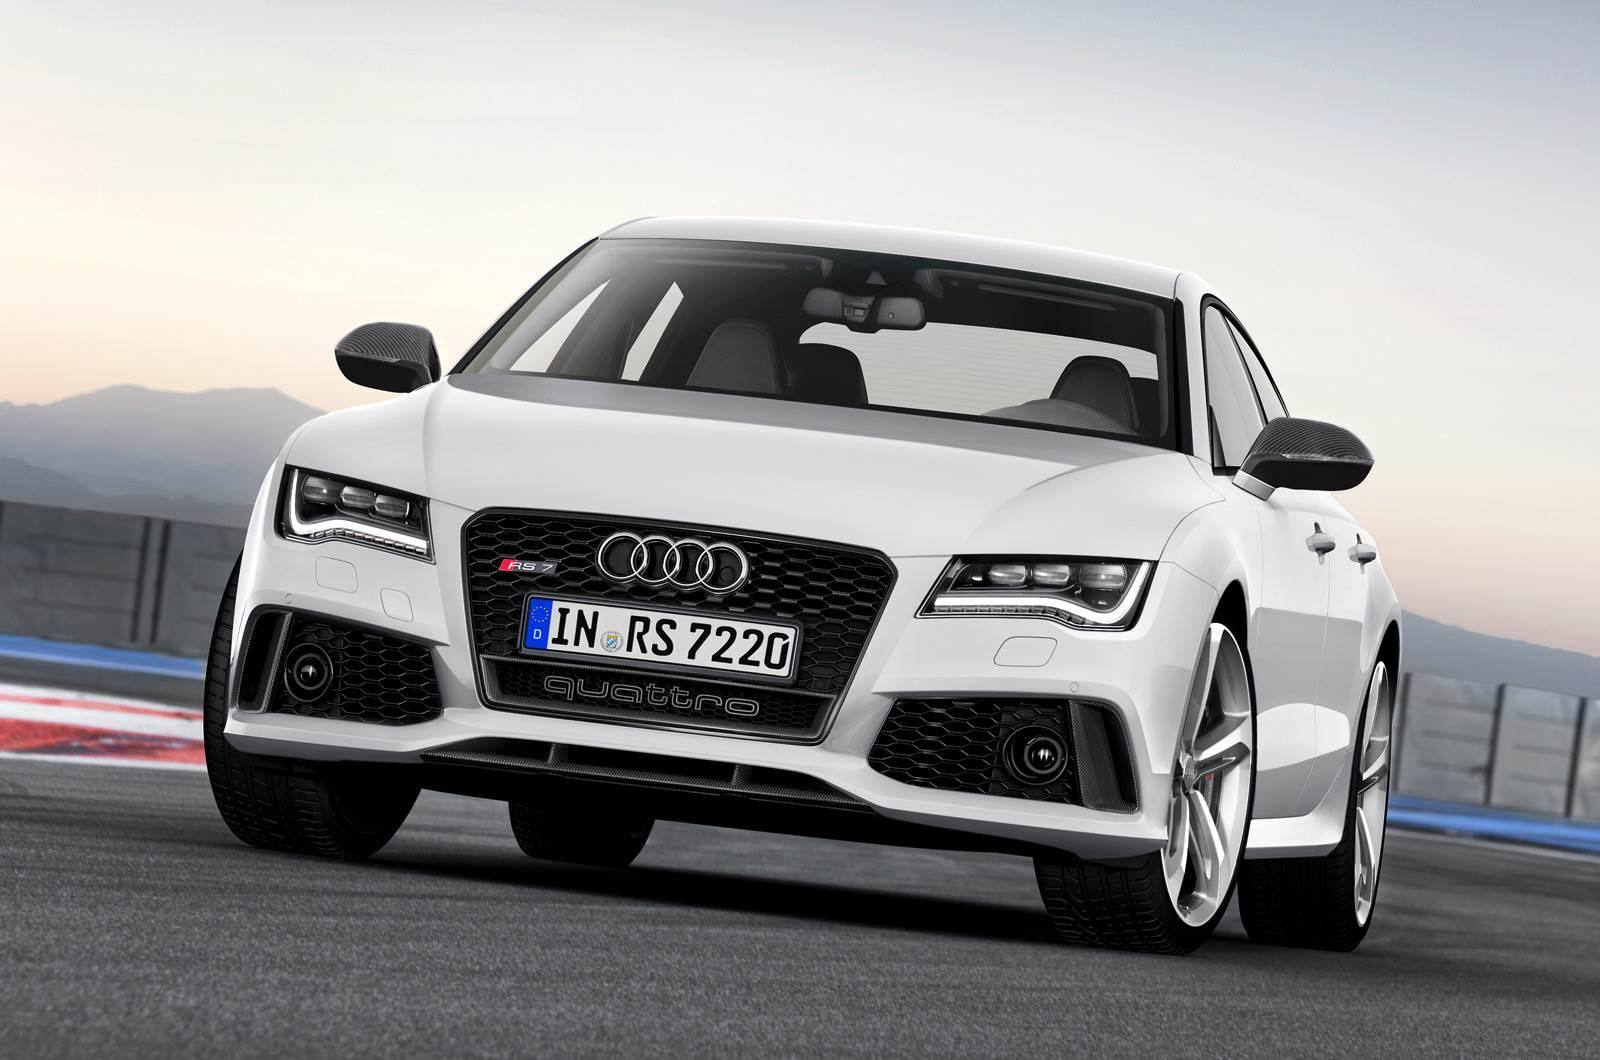 Audi RS7 revealed